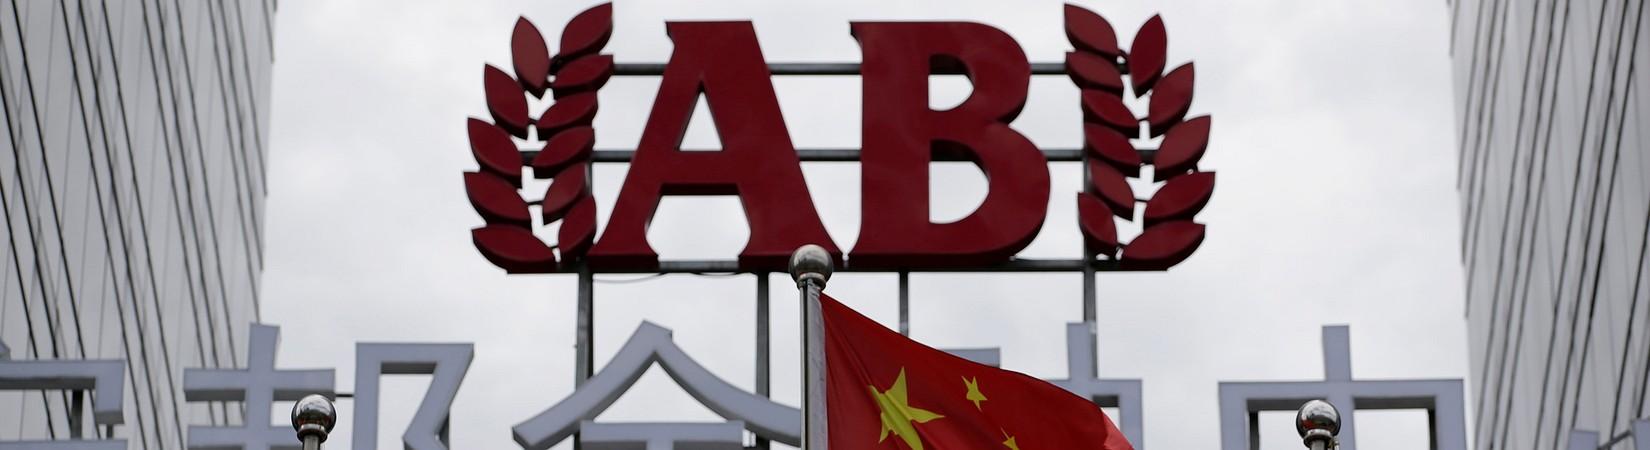 'Anbang abandons bid to takeover Fidelity'